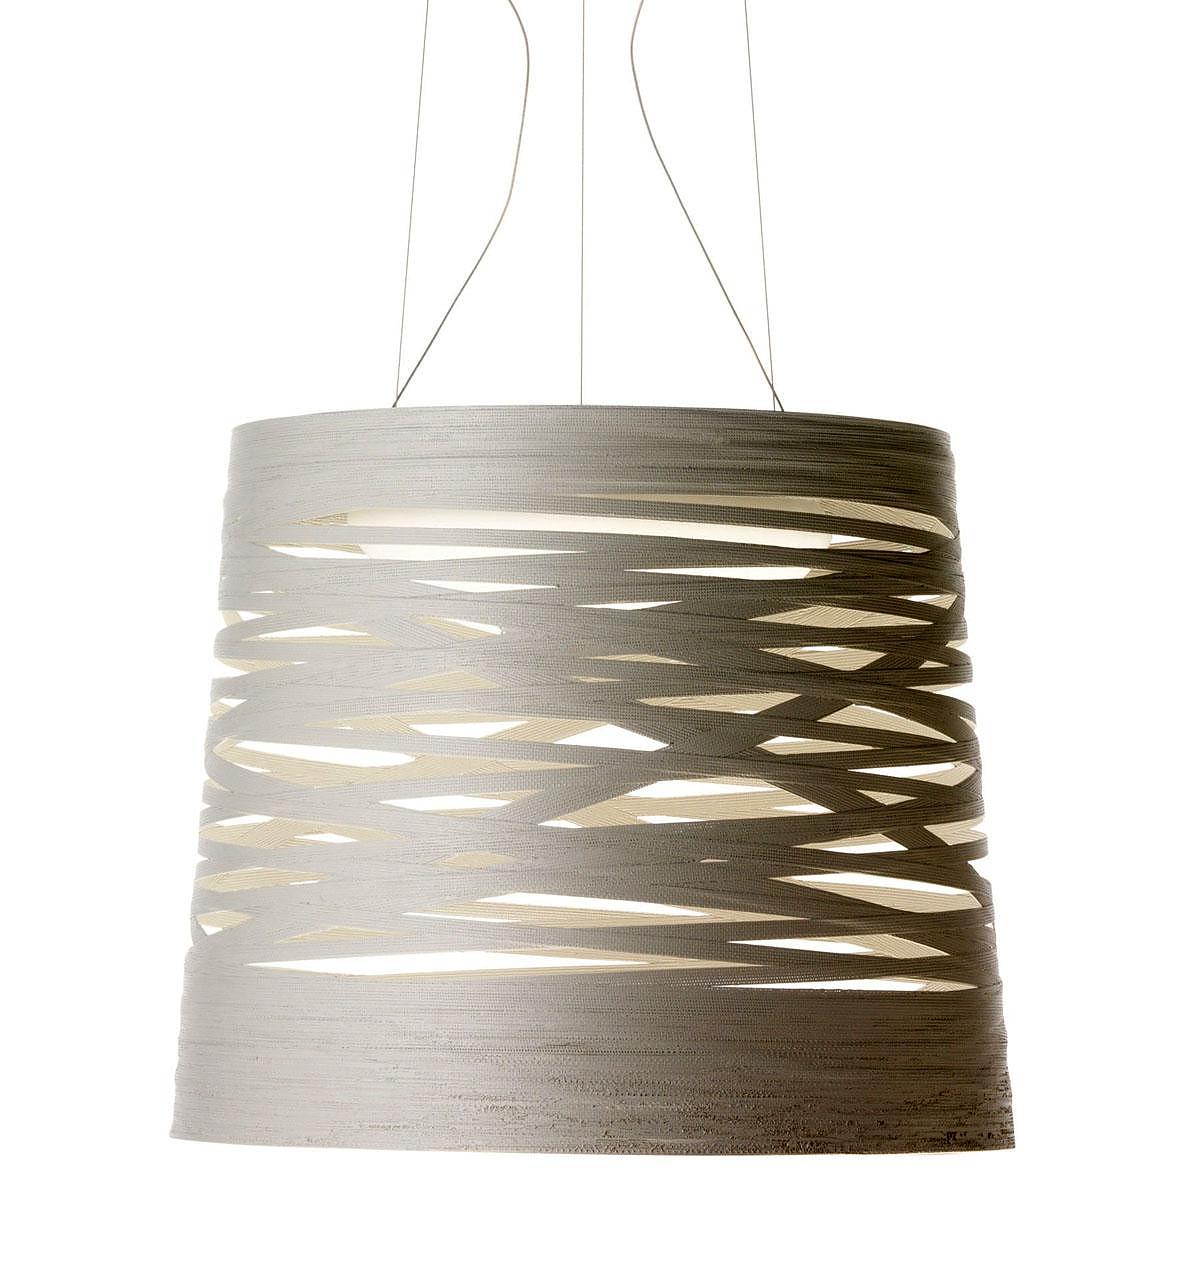 Foscarini Tress Lamps by Marc Sadler.